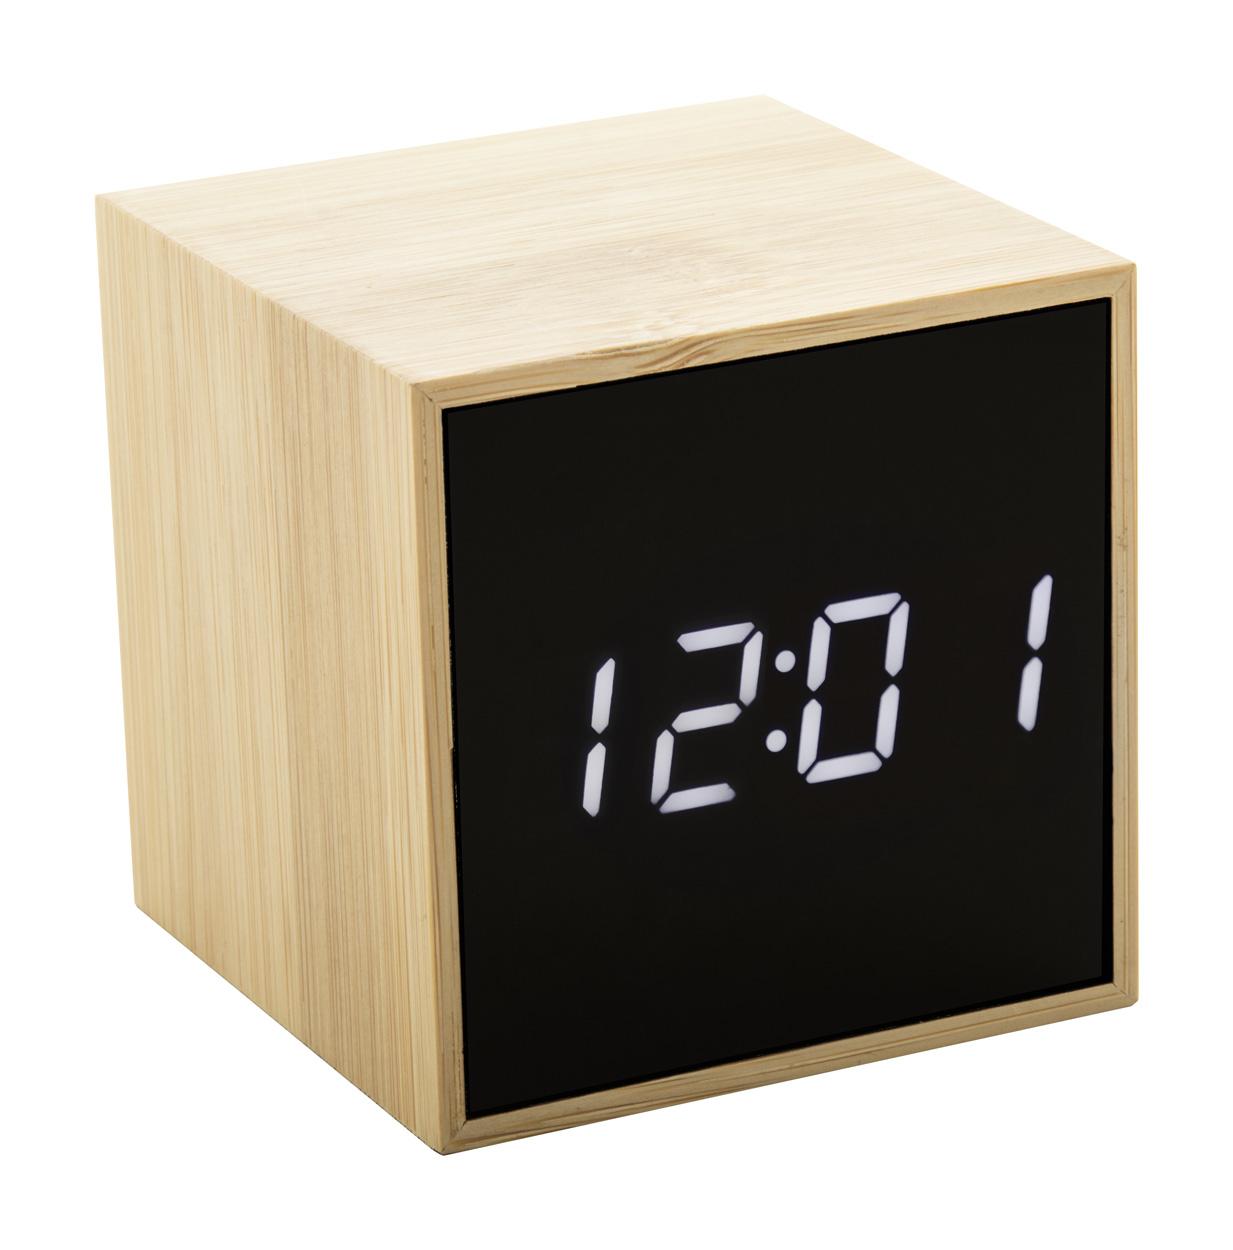 Boolarm bamboo alarm clock